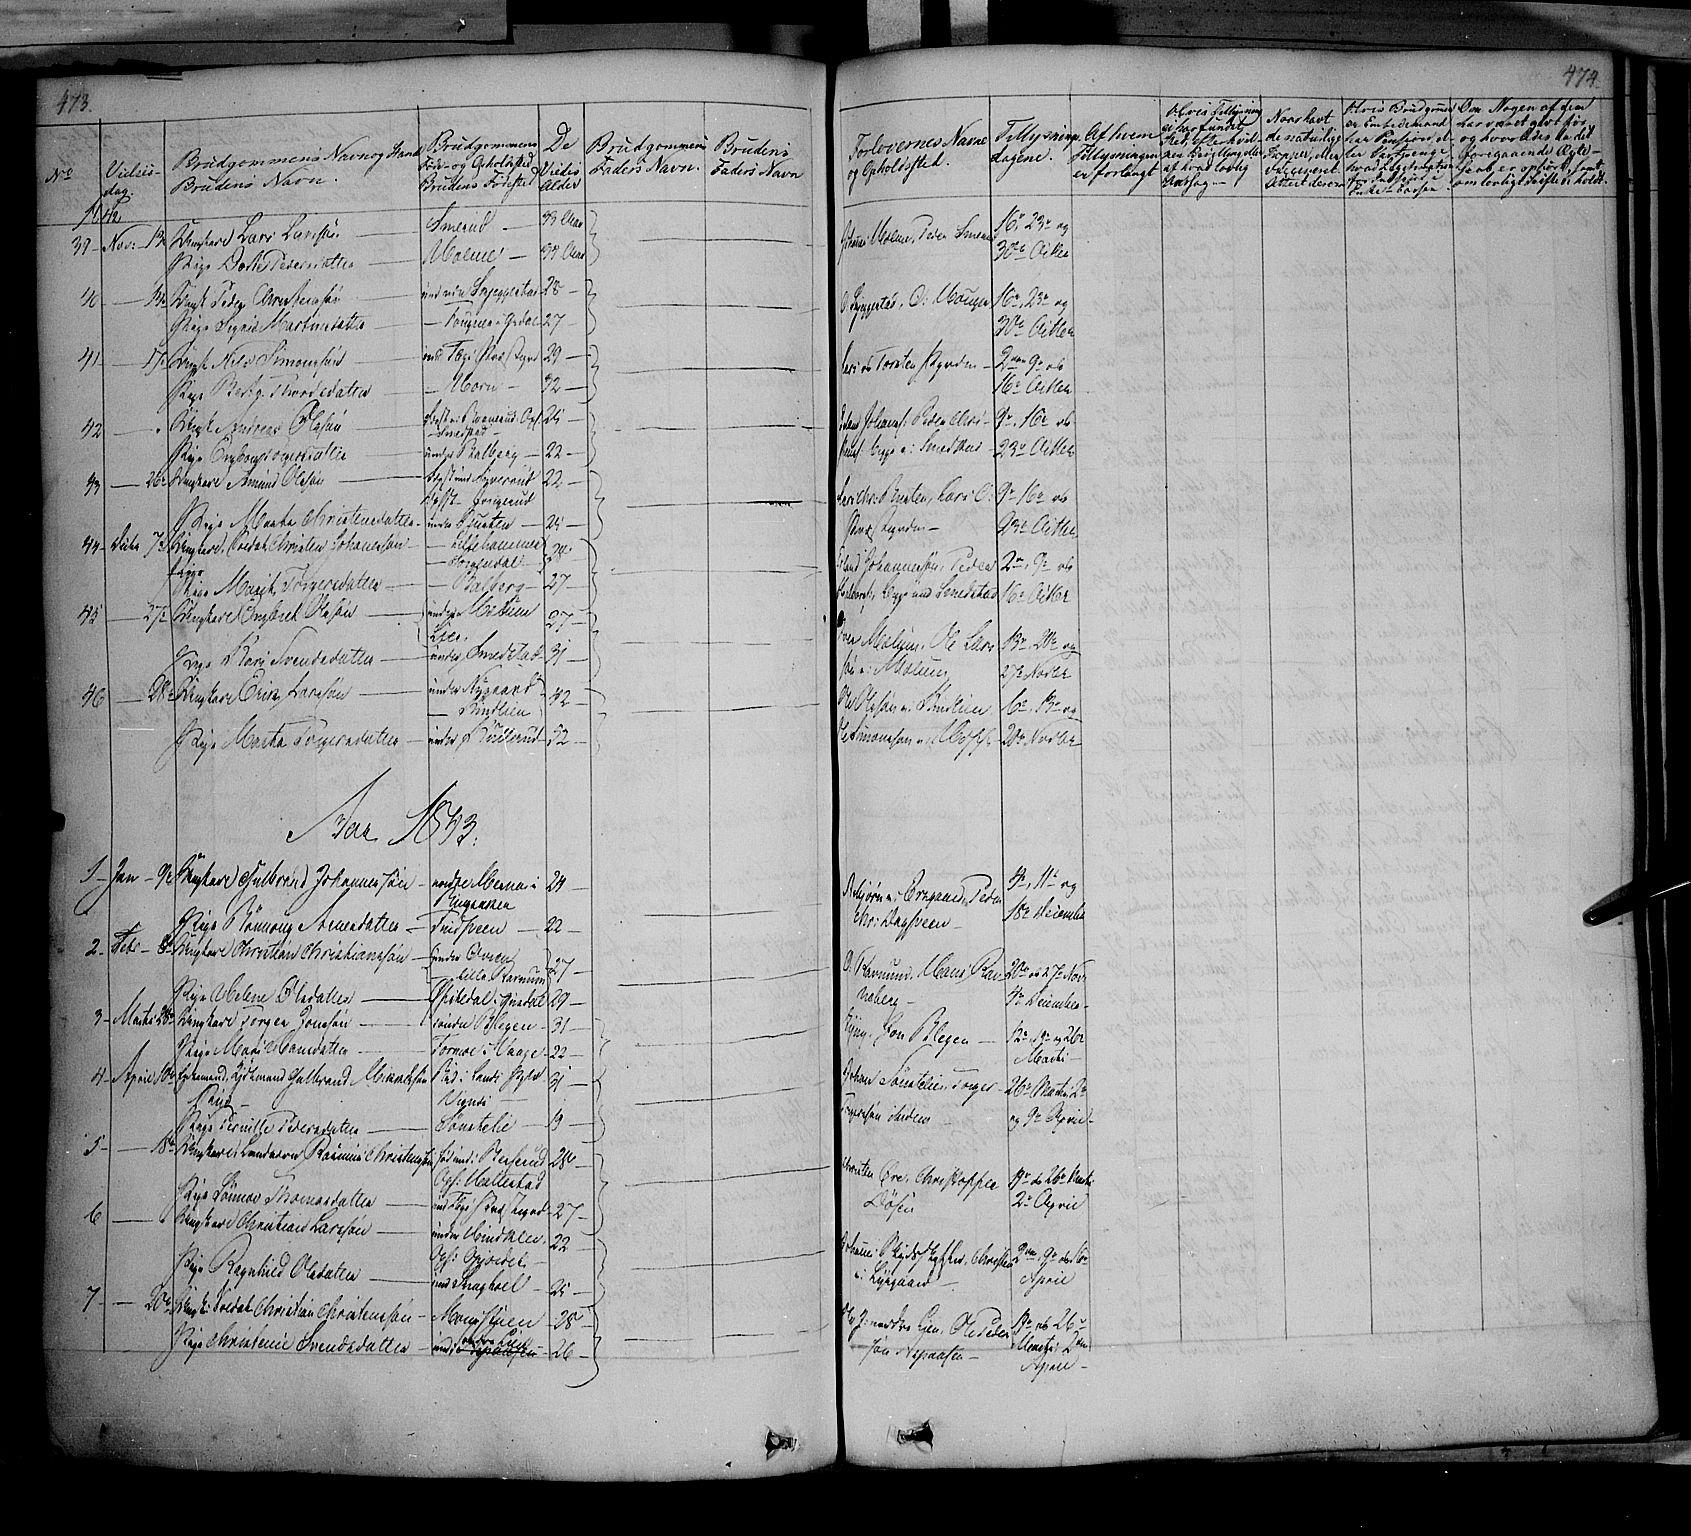 SAH, Fåberg prestekontor, Ministerialbok nr. 5, 1836-1854, s. 473-474